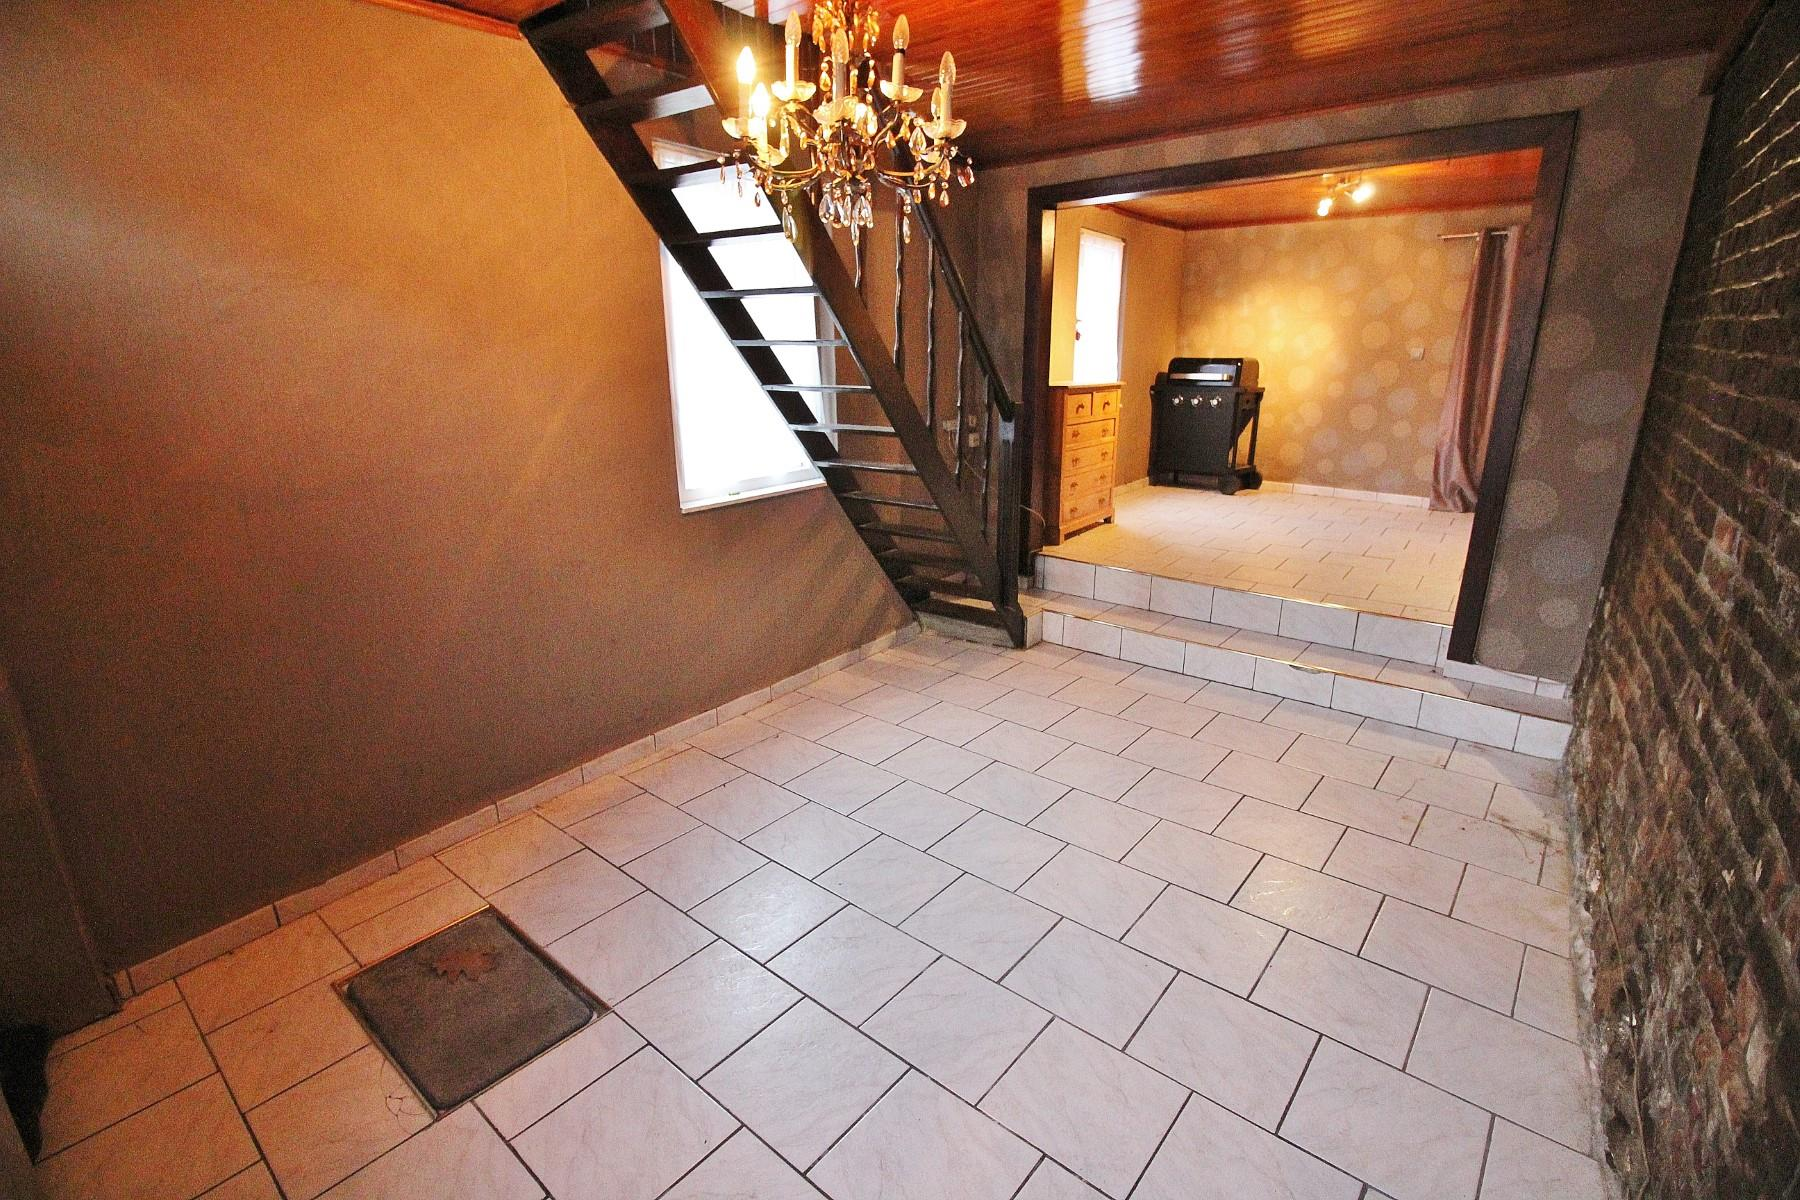 Maison - Beyne-Heusay Bellaire - #3946189-1